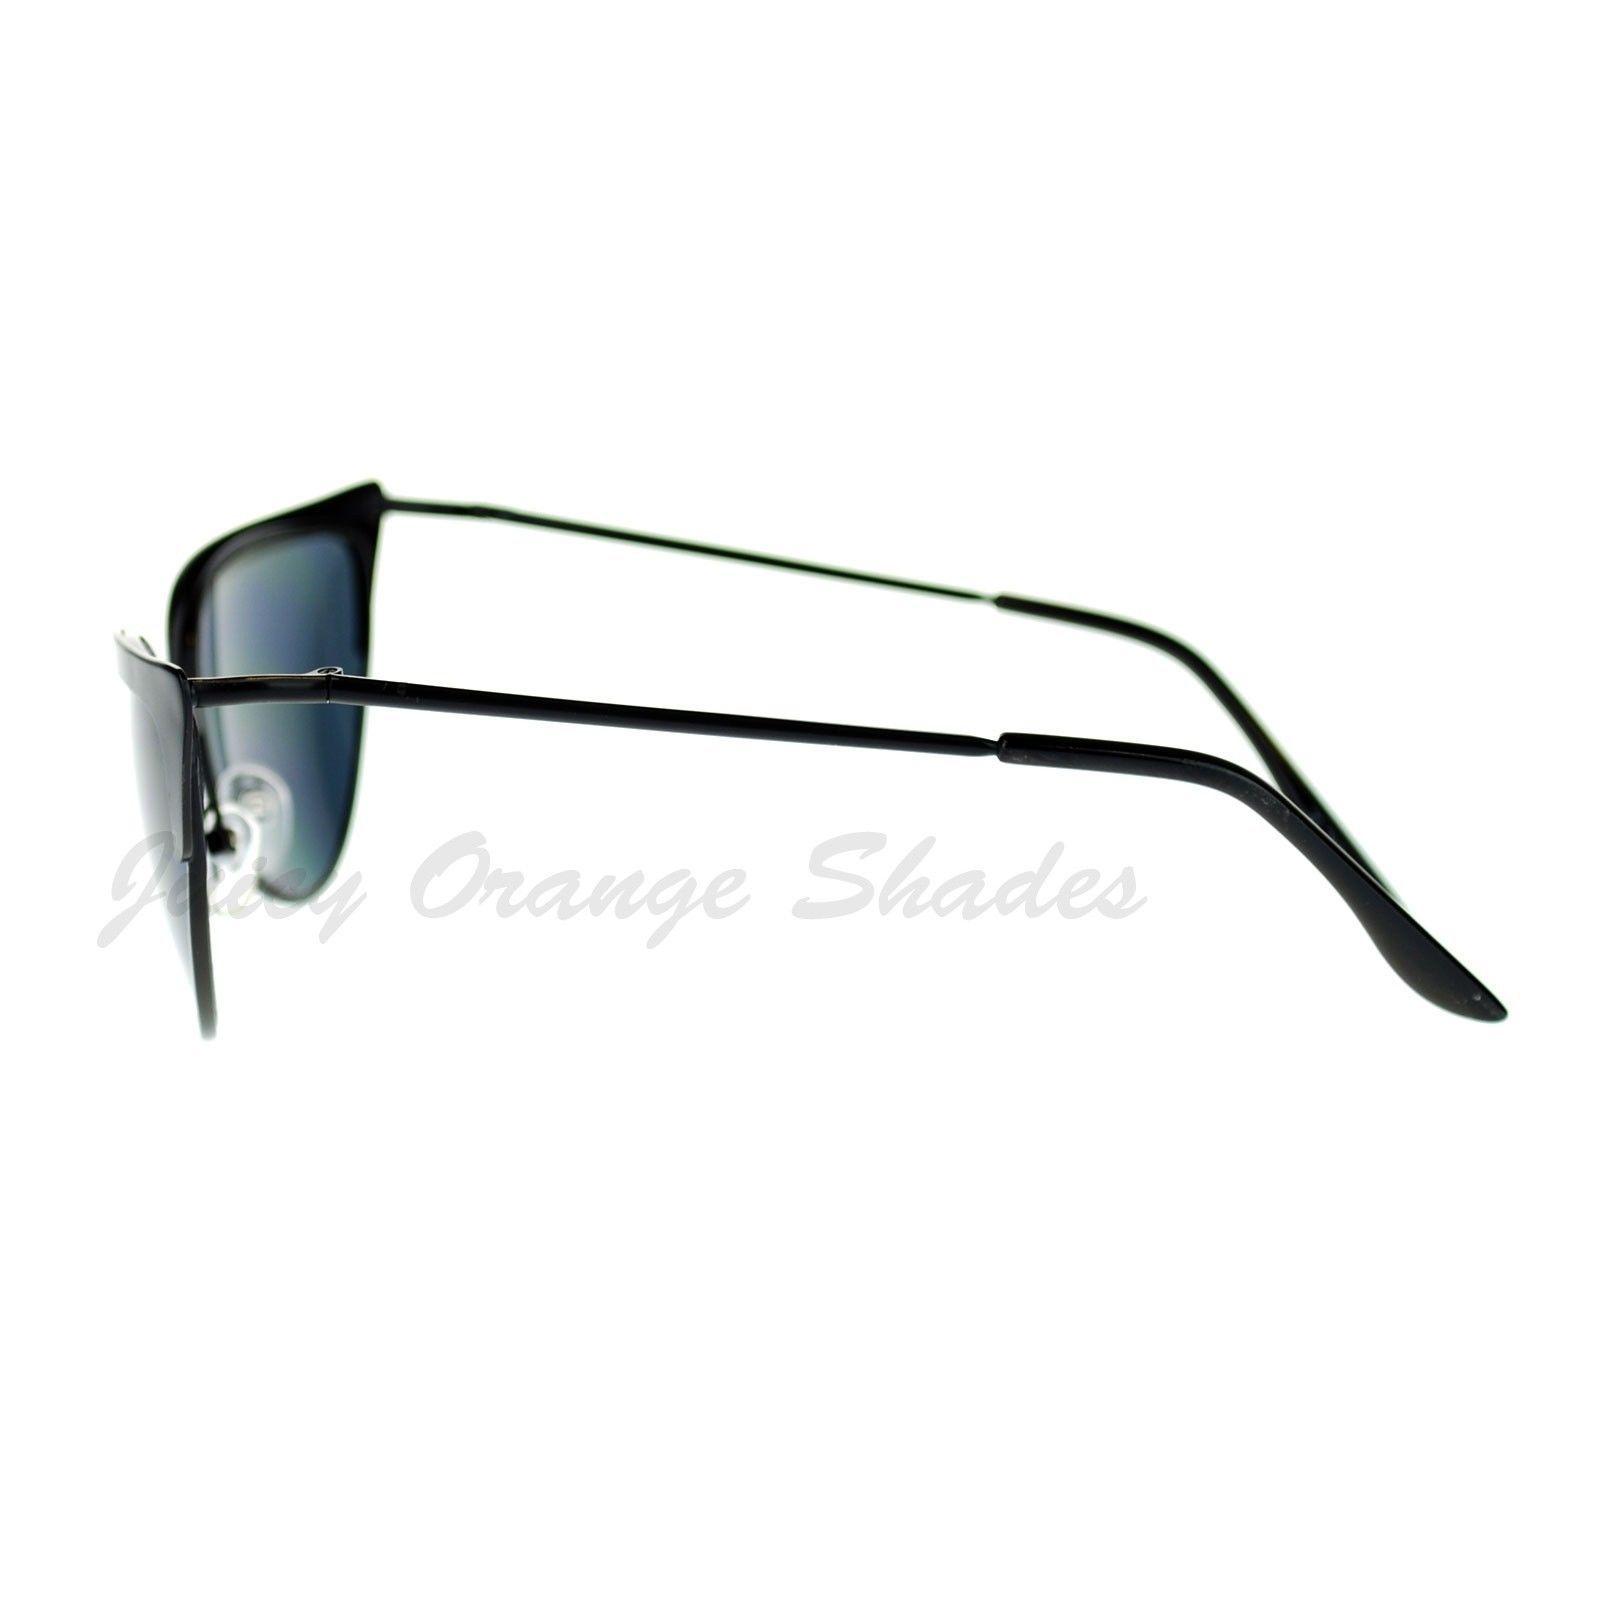 Bolded Top Cateye Metal Frame Sunglasses Women's Fashion